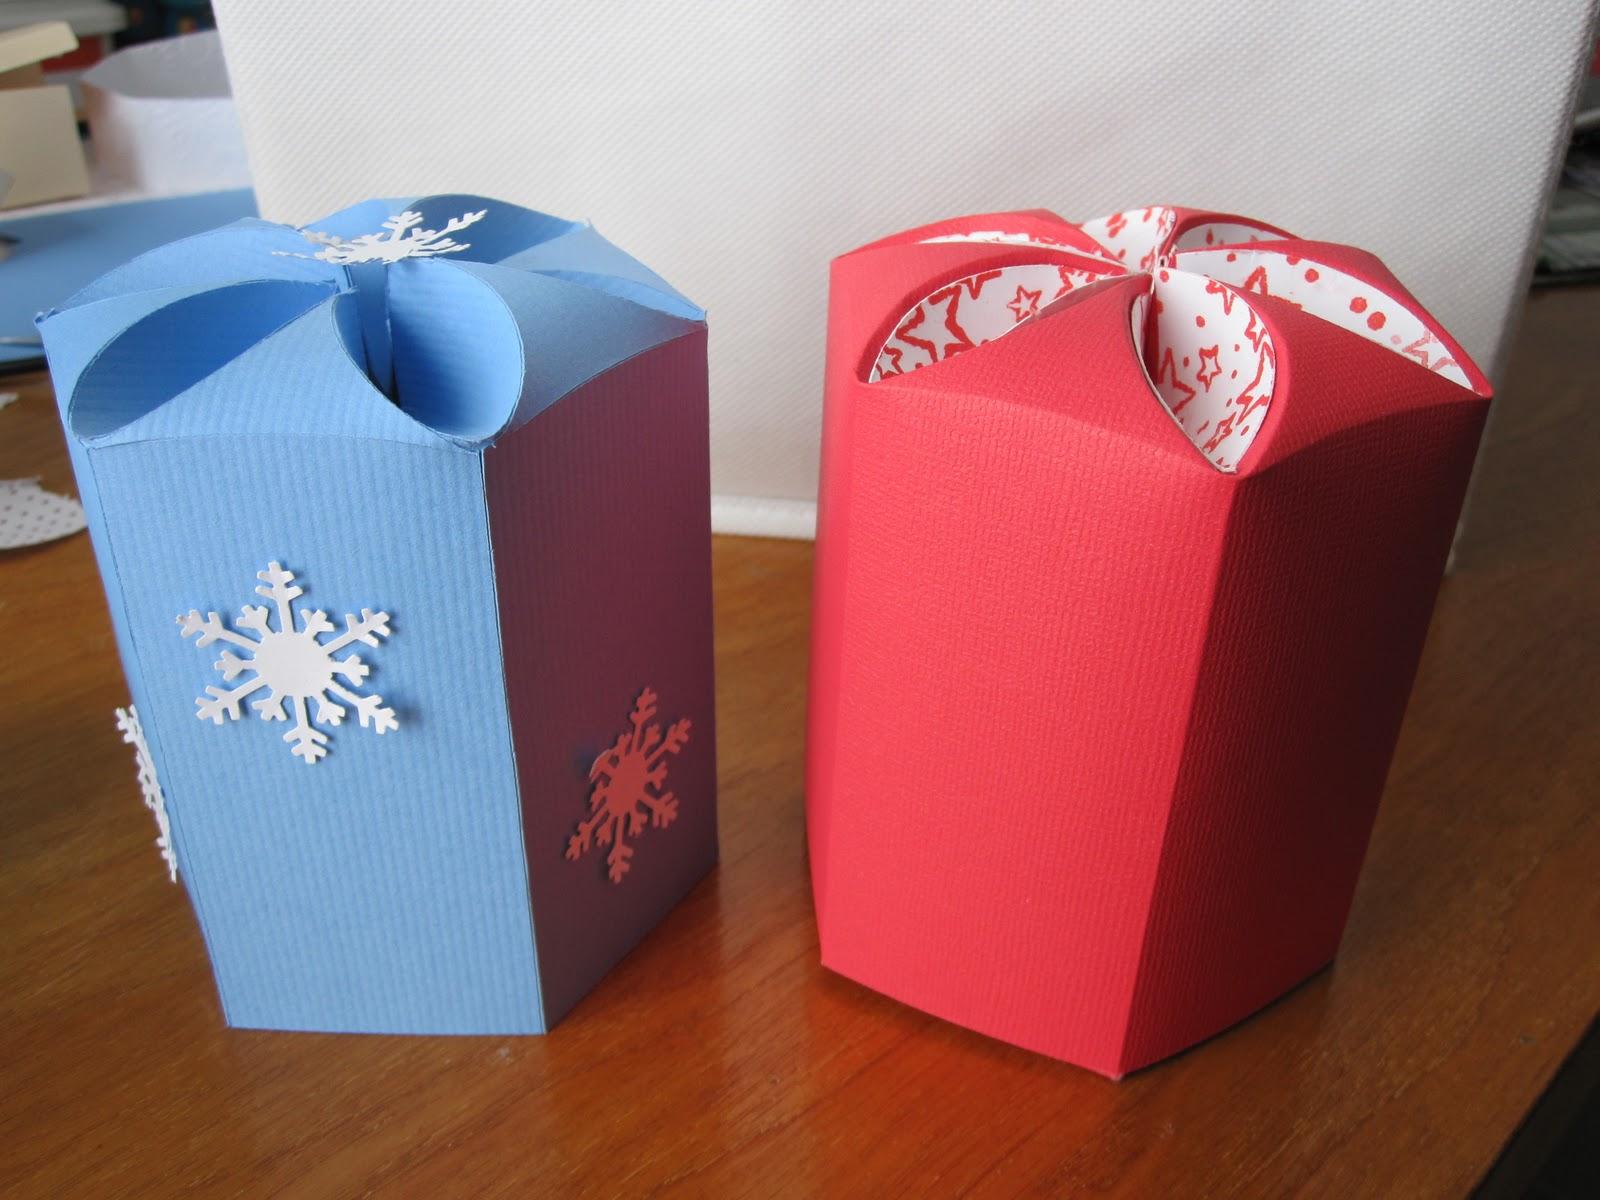 Papercraft Gift Box Templates | IMG 1303